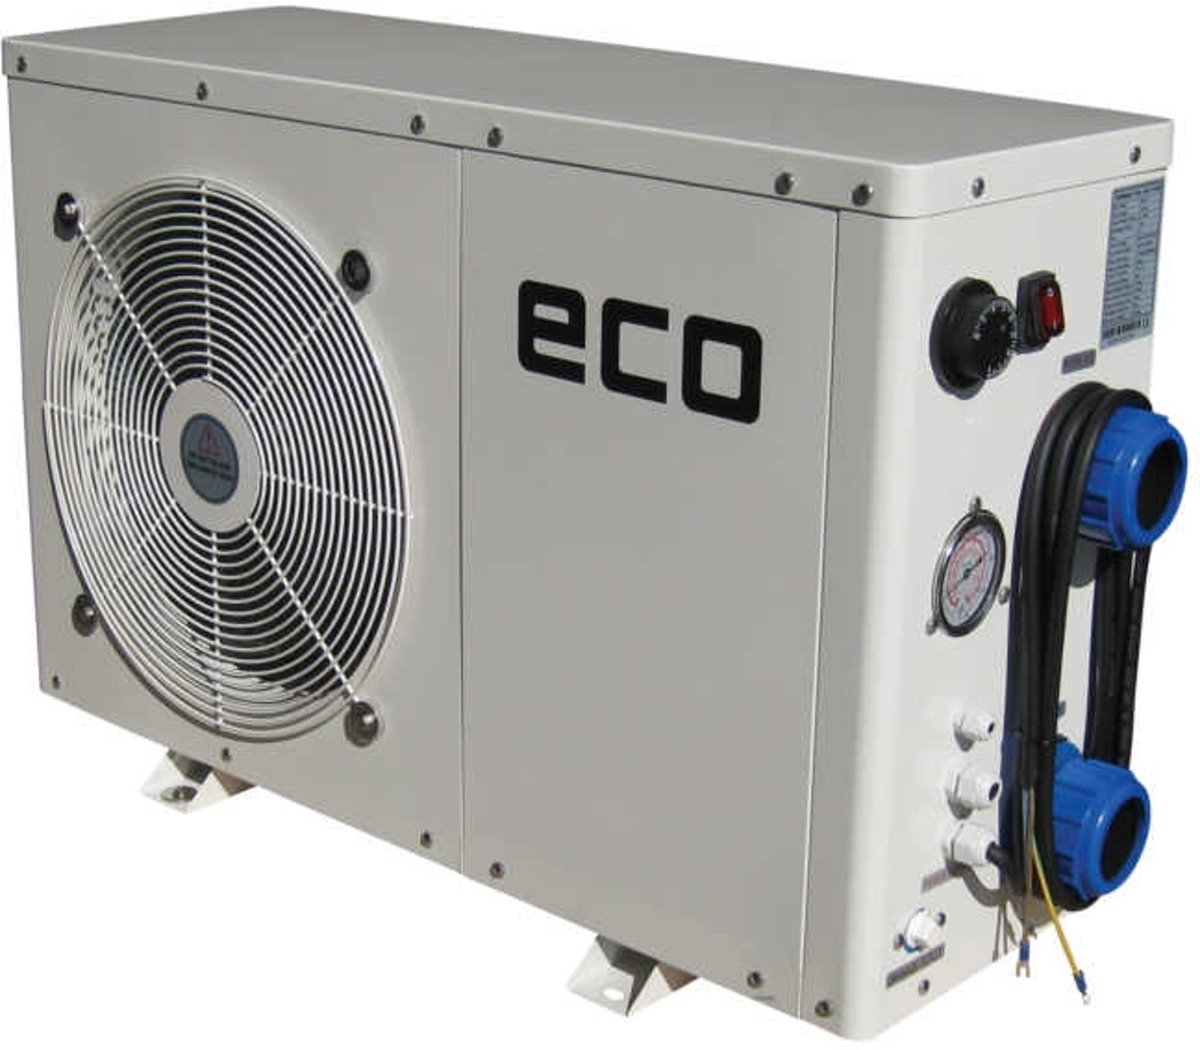 Zwembad warmtepomp ECO 5 (45 kw)